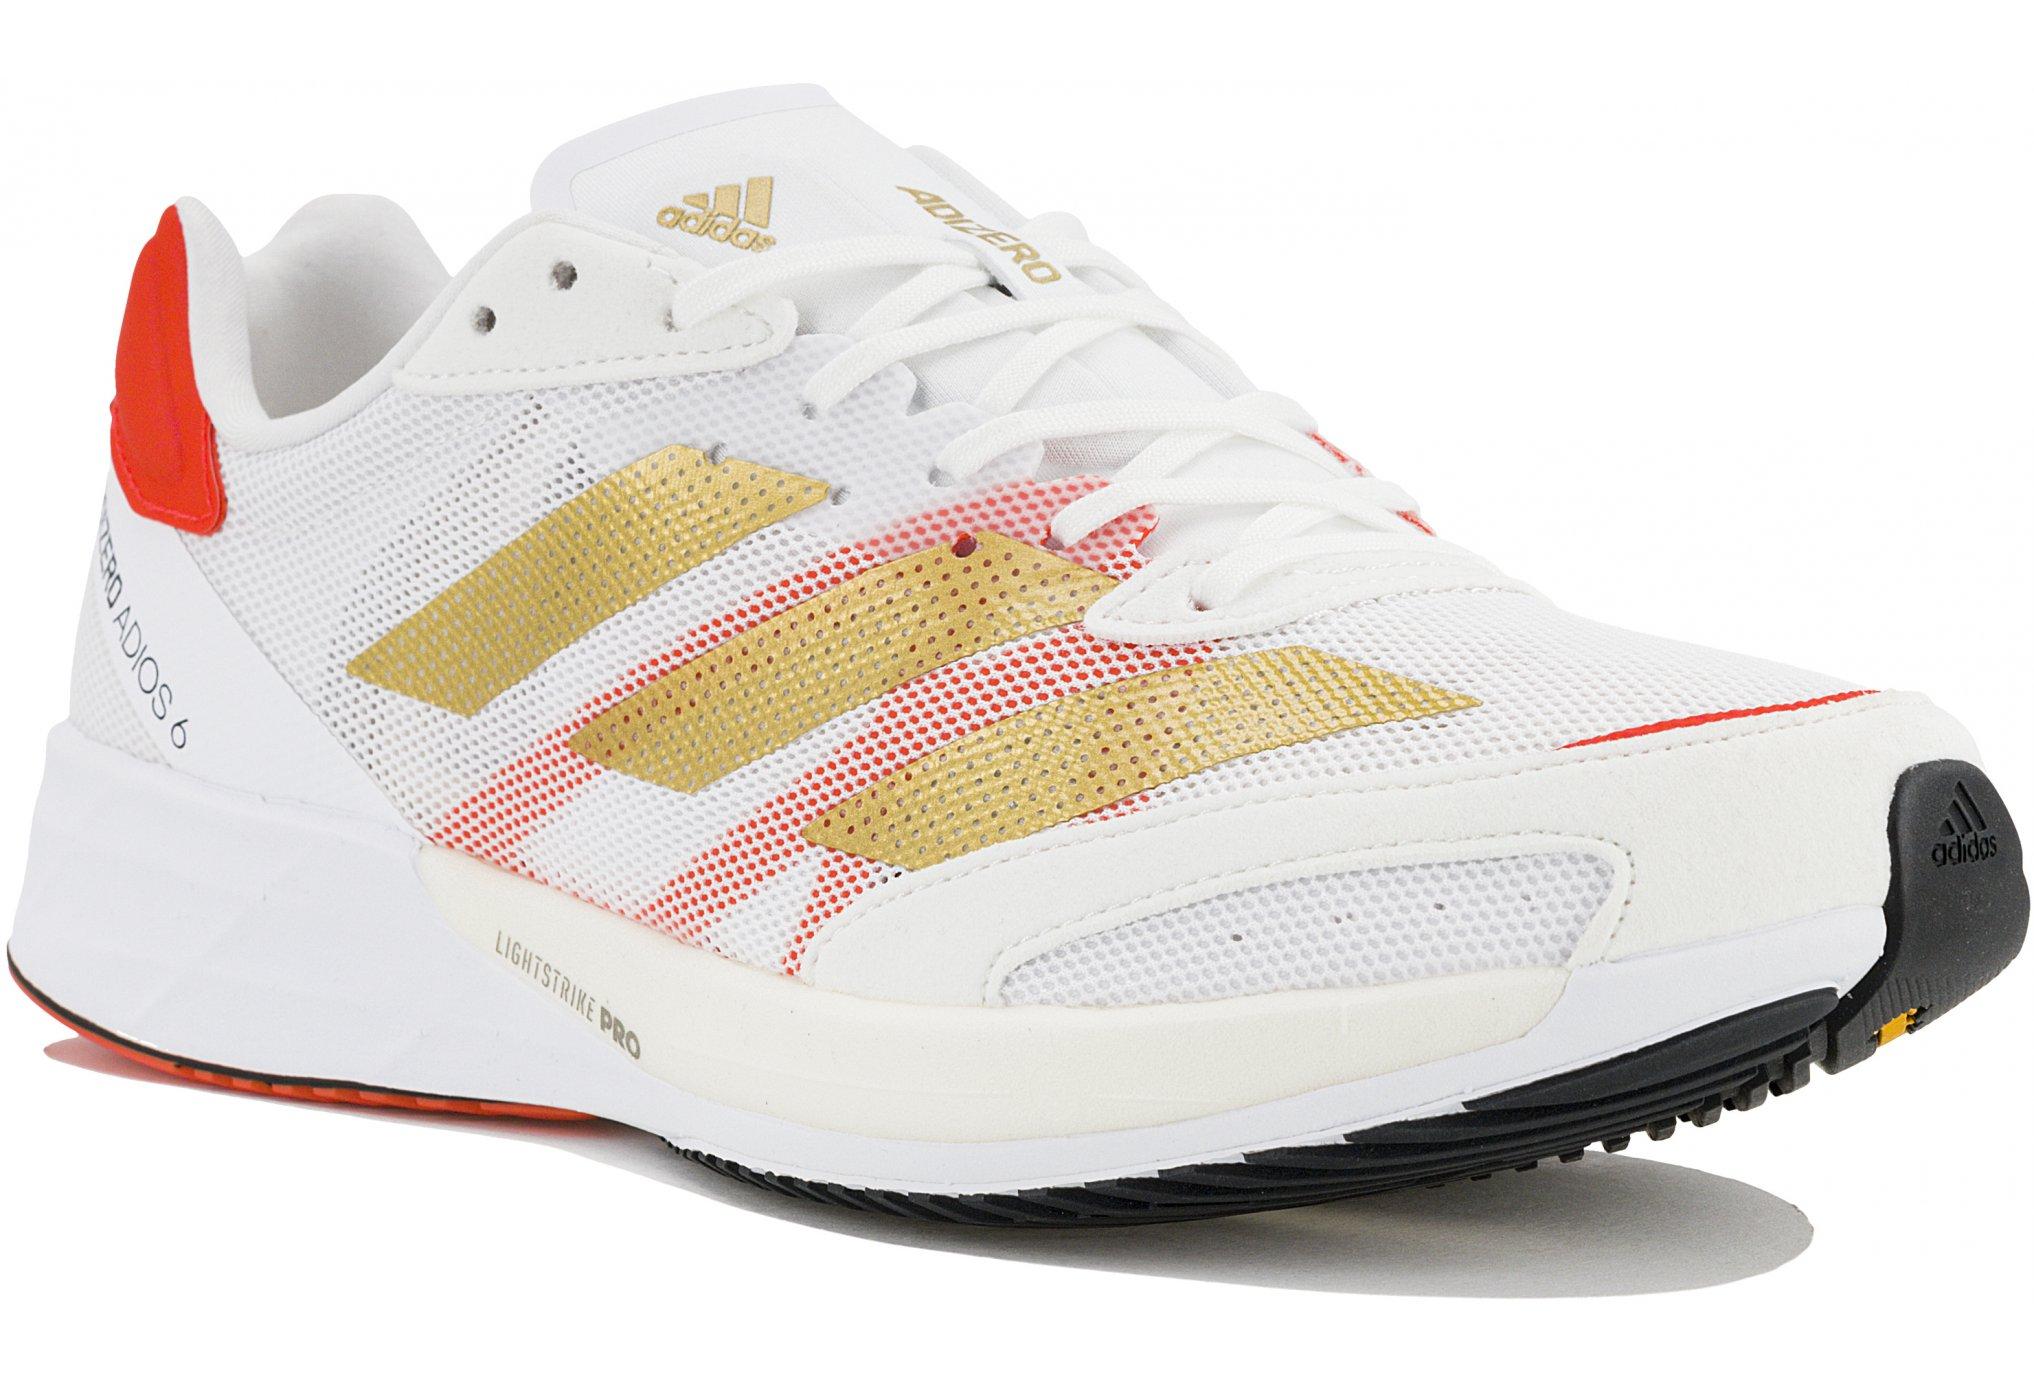 adidas adizero adios 6 Primegreen Tokyo W Chaussures running femme